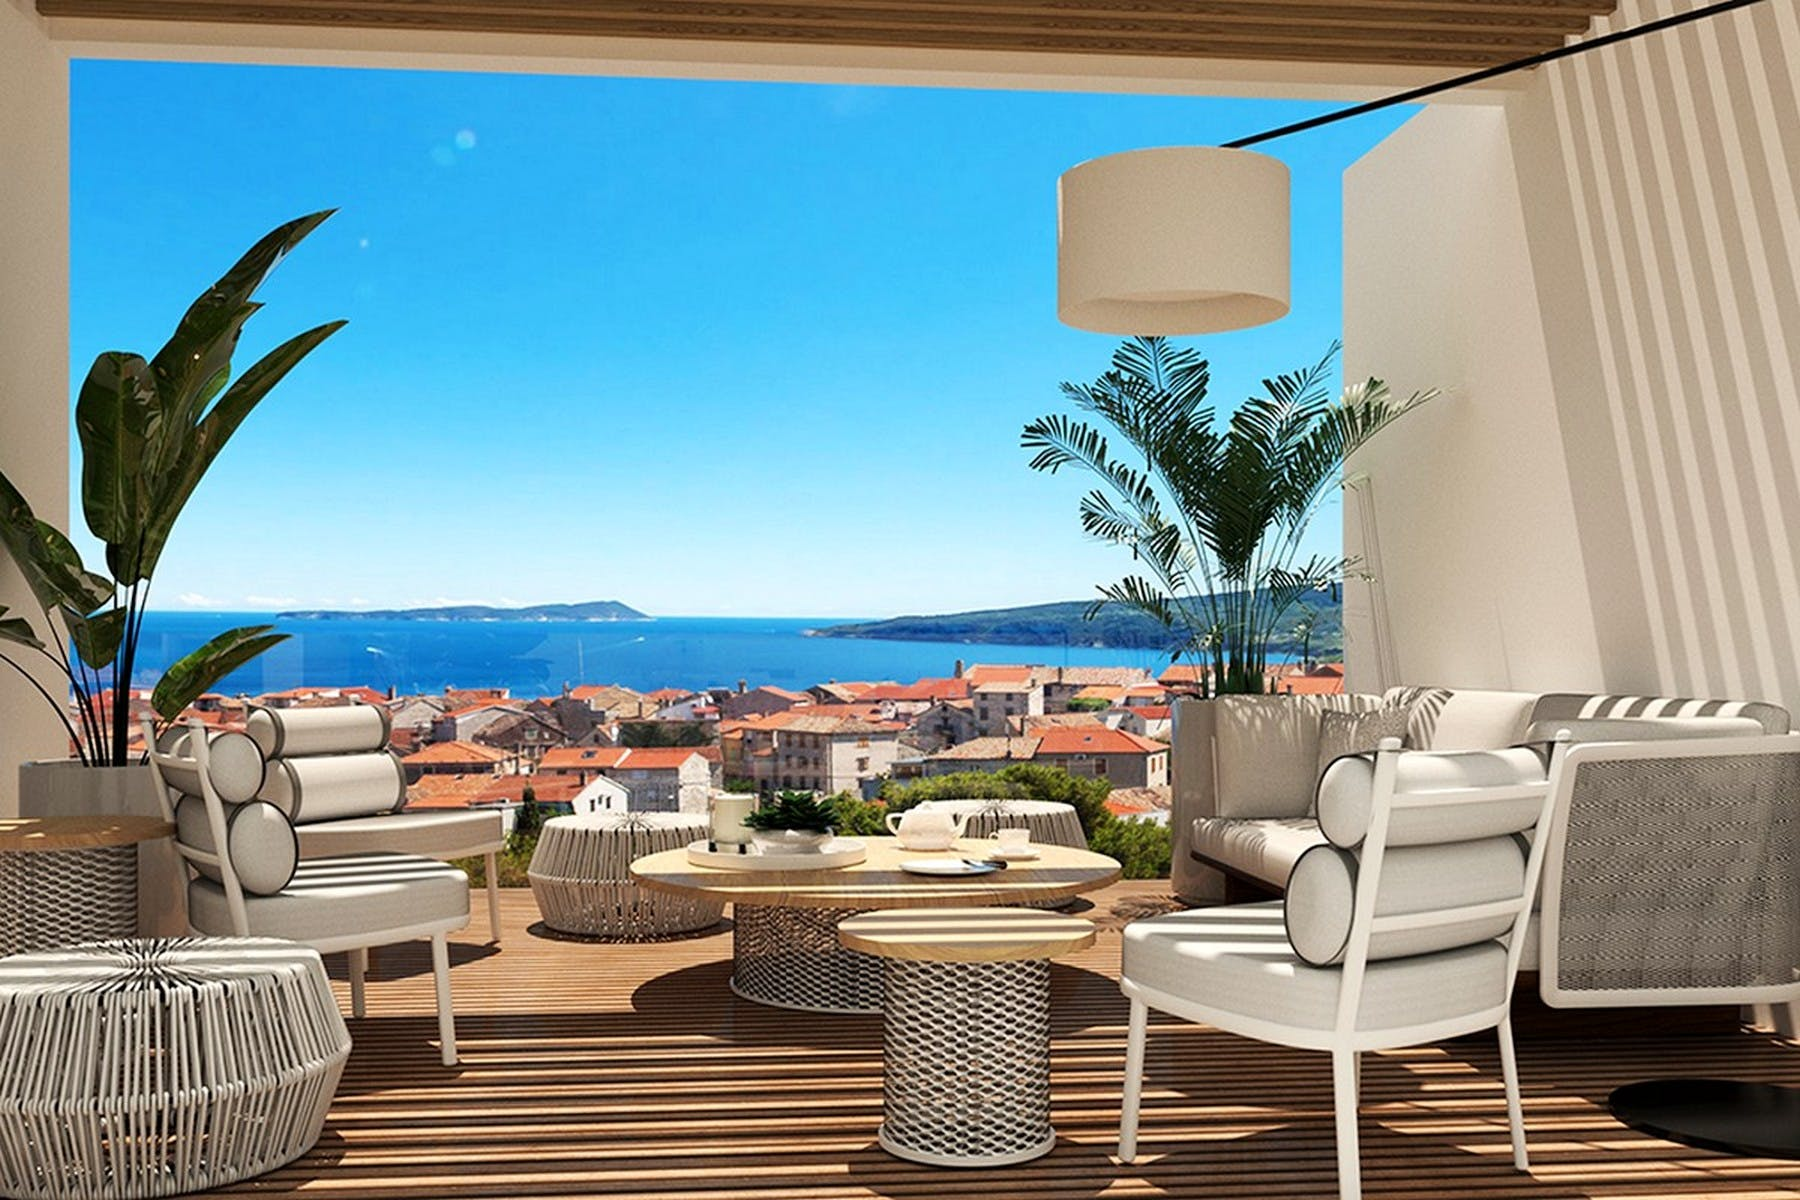 View over the Adriatic sea